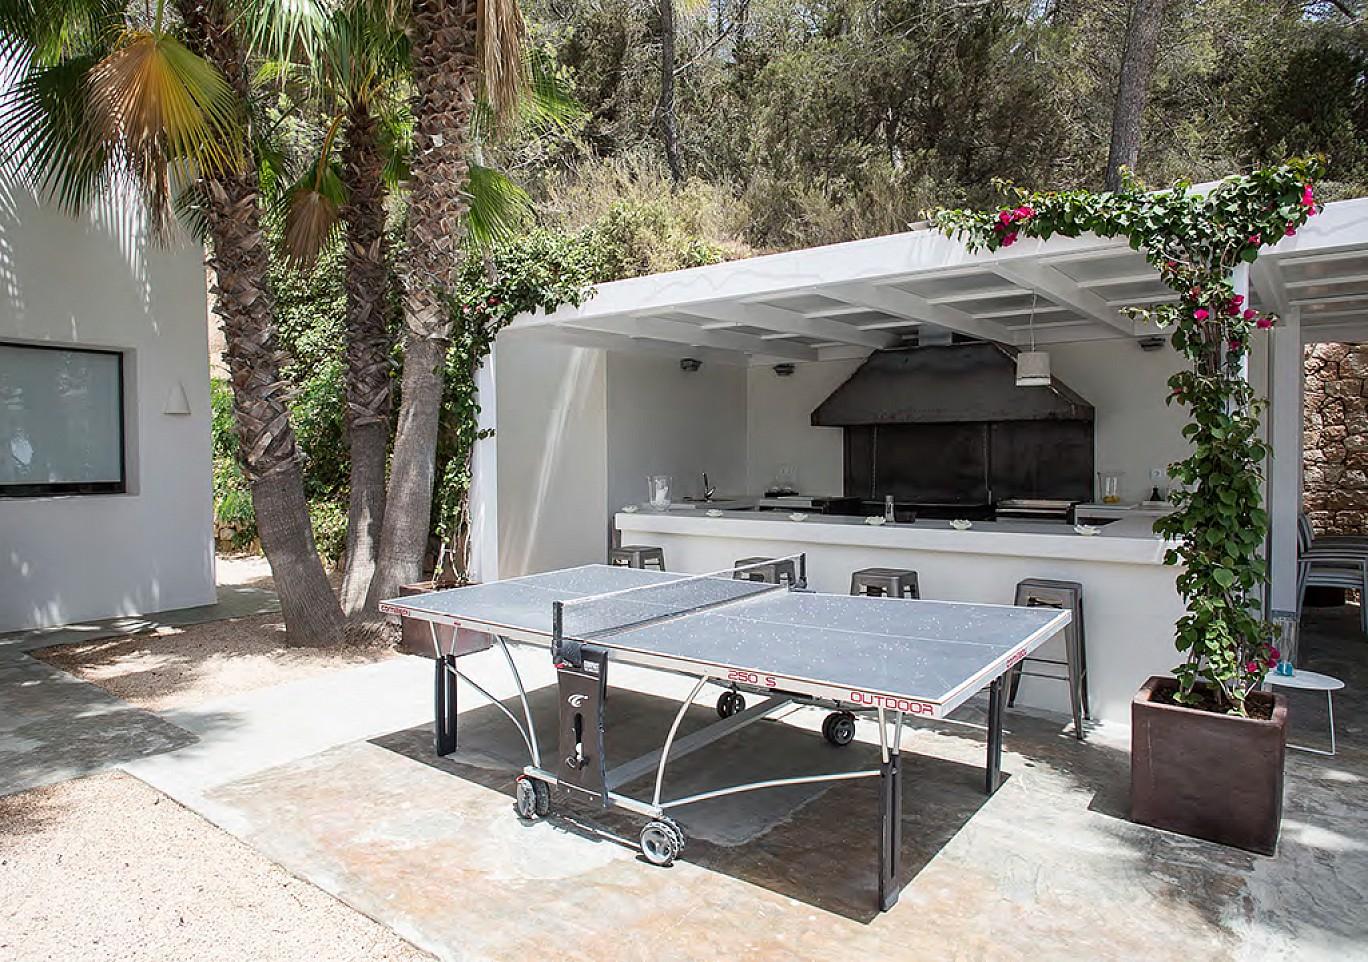 Mesa de ping pong junto a la cocina exterior